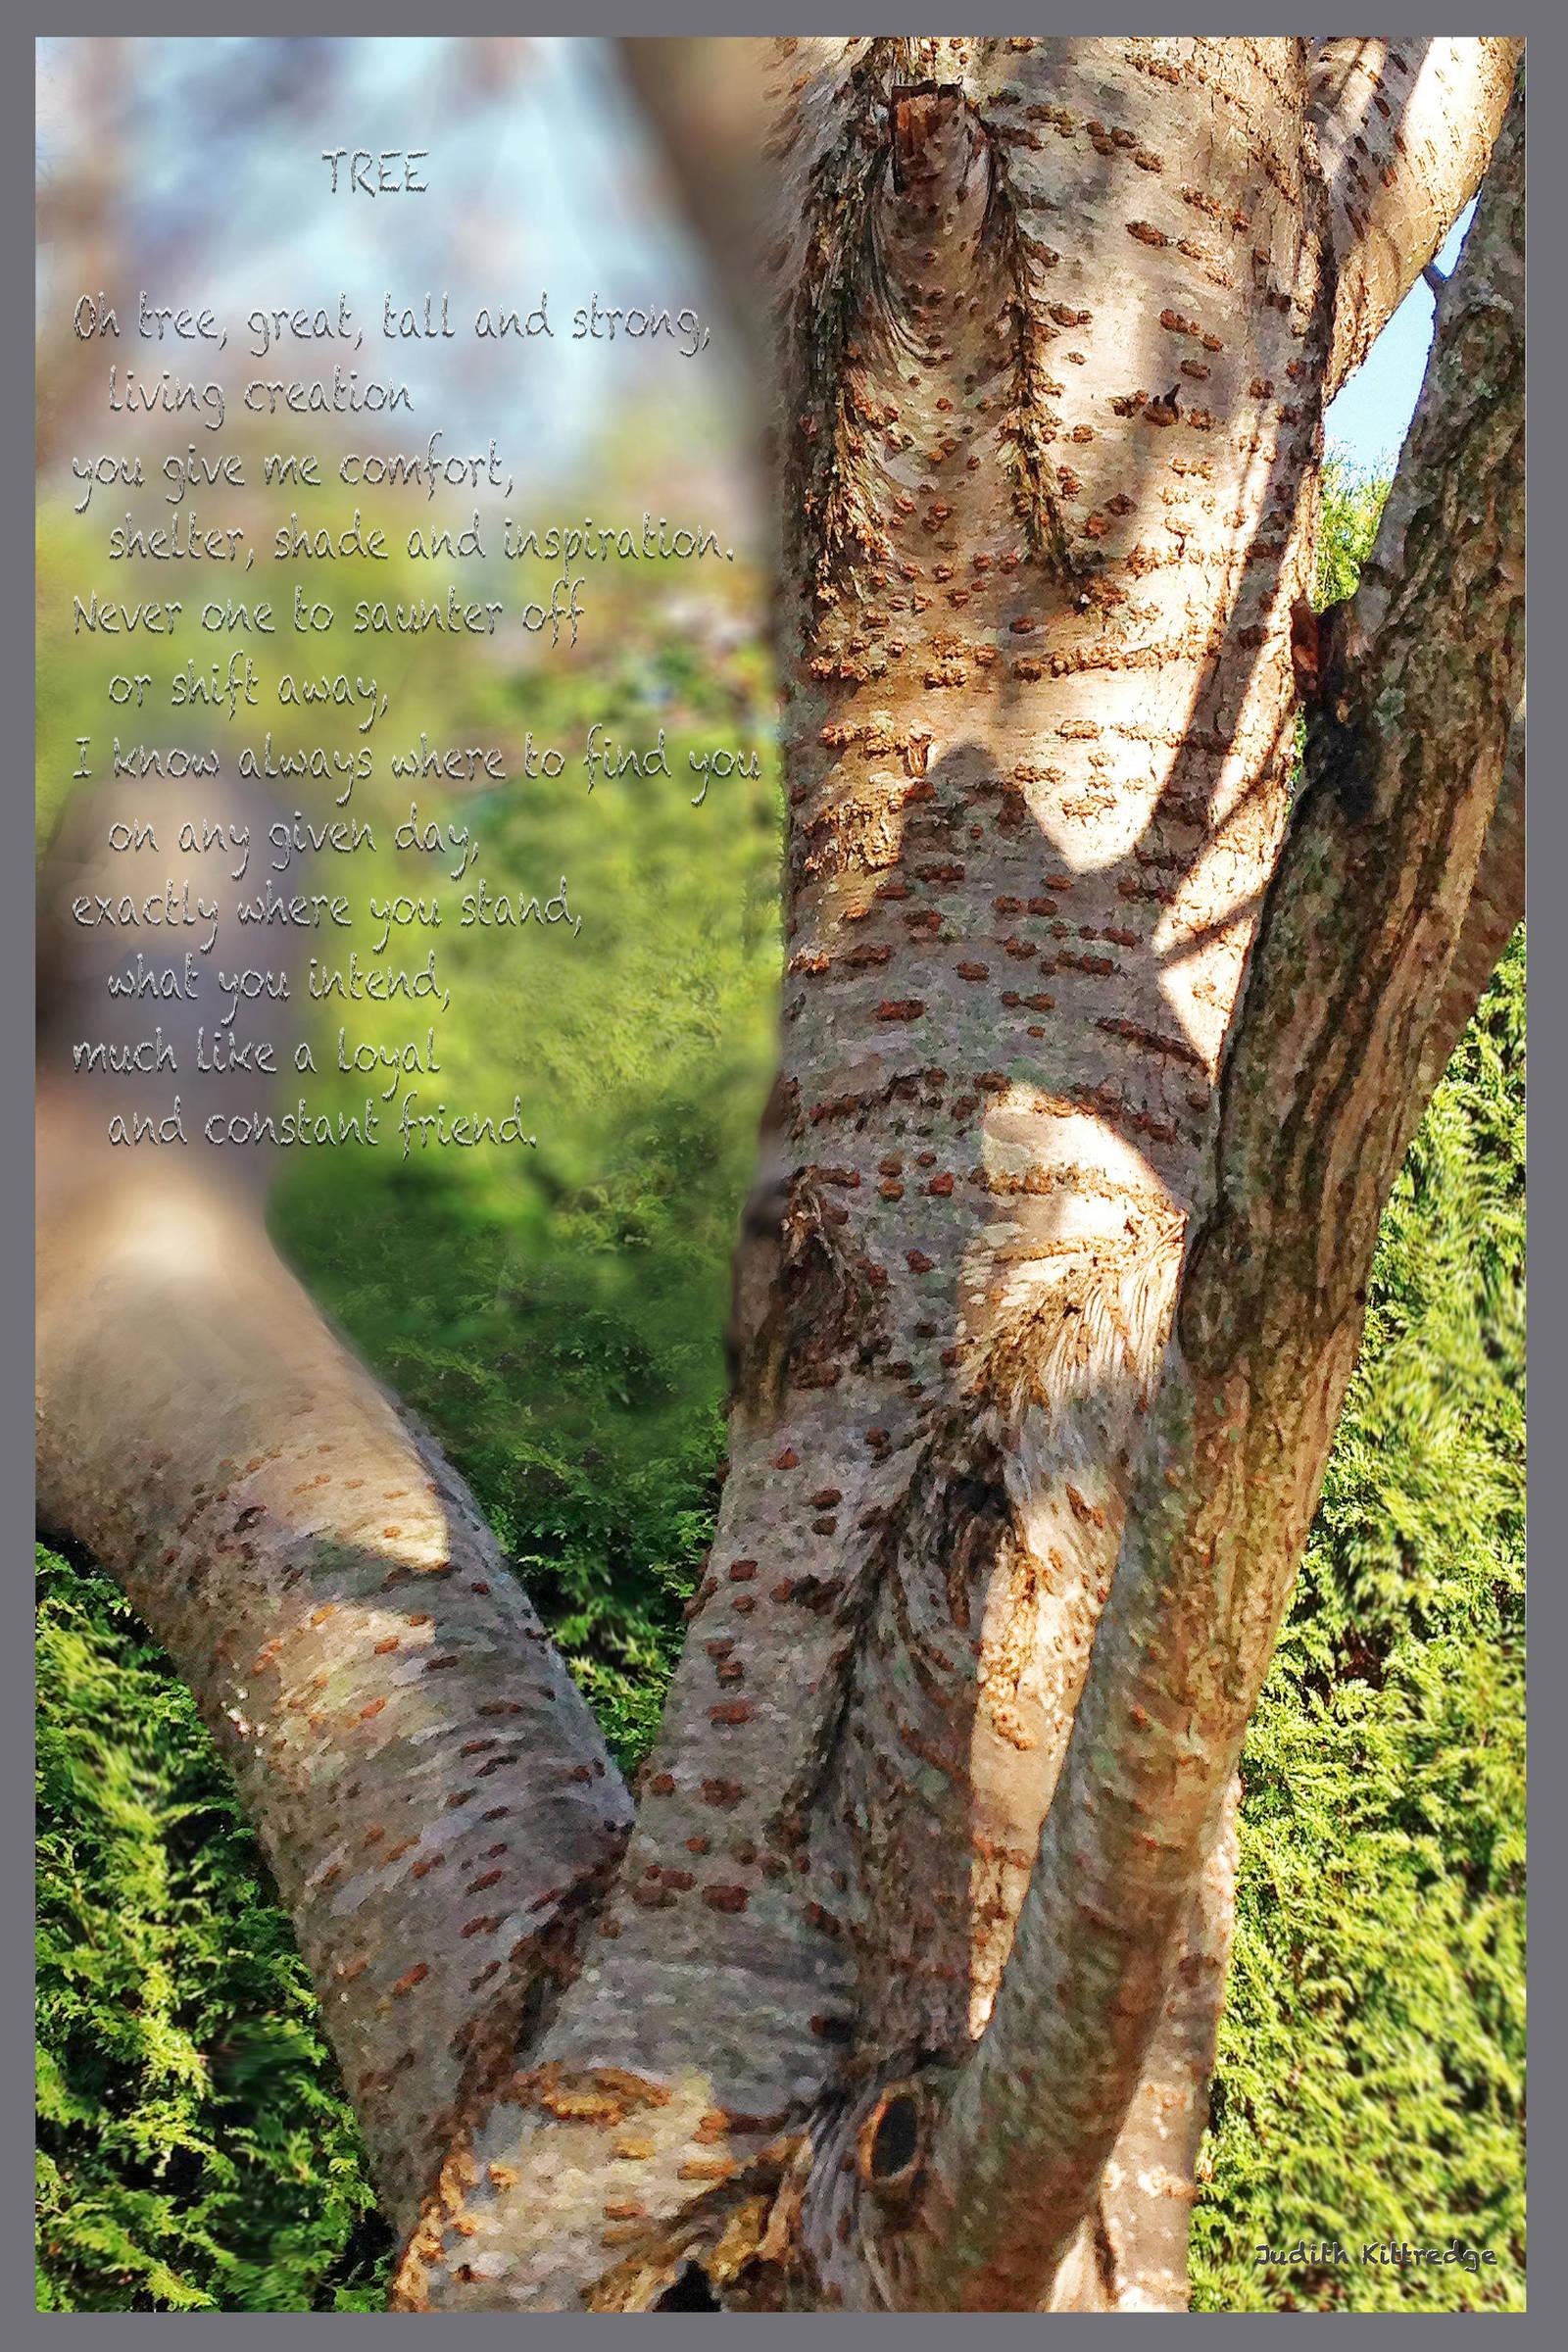 TreeFirstFramed by JKittredge